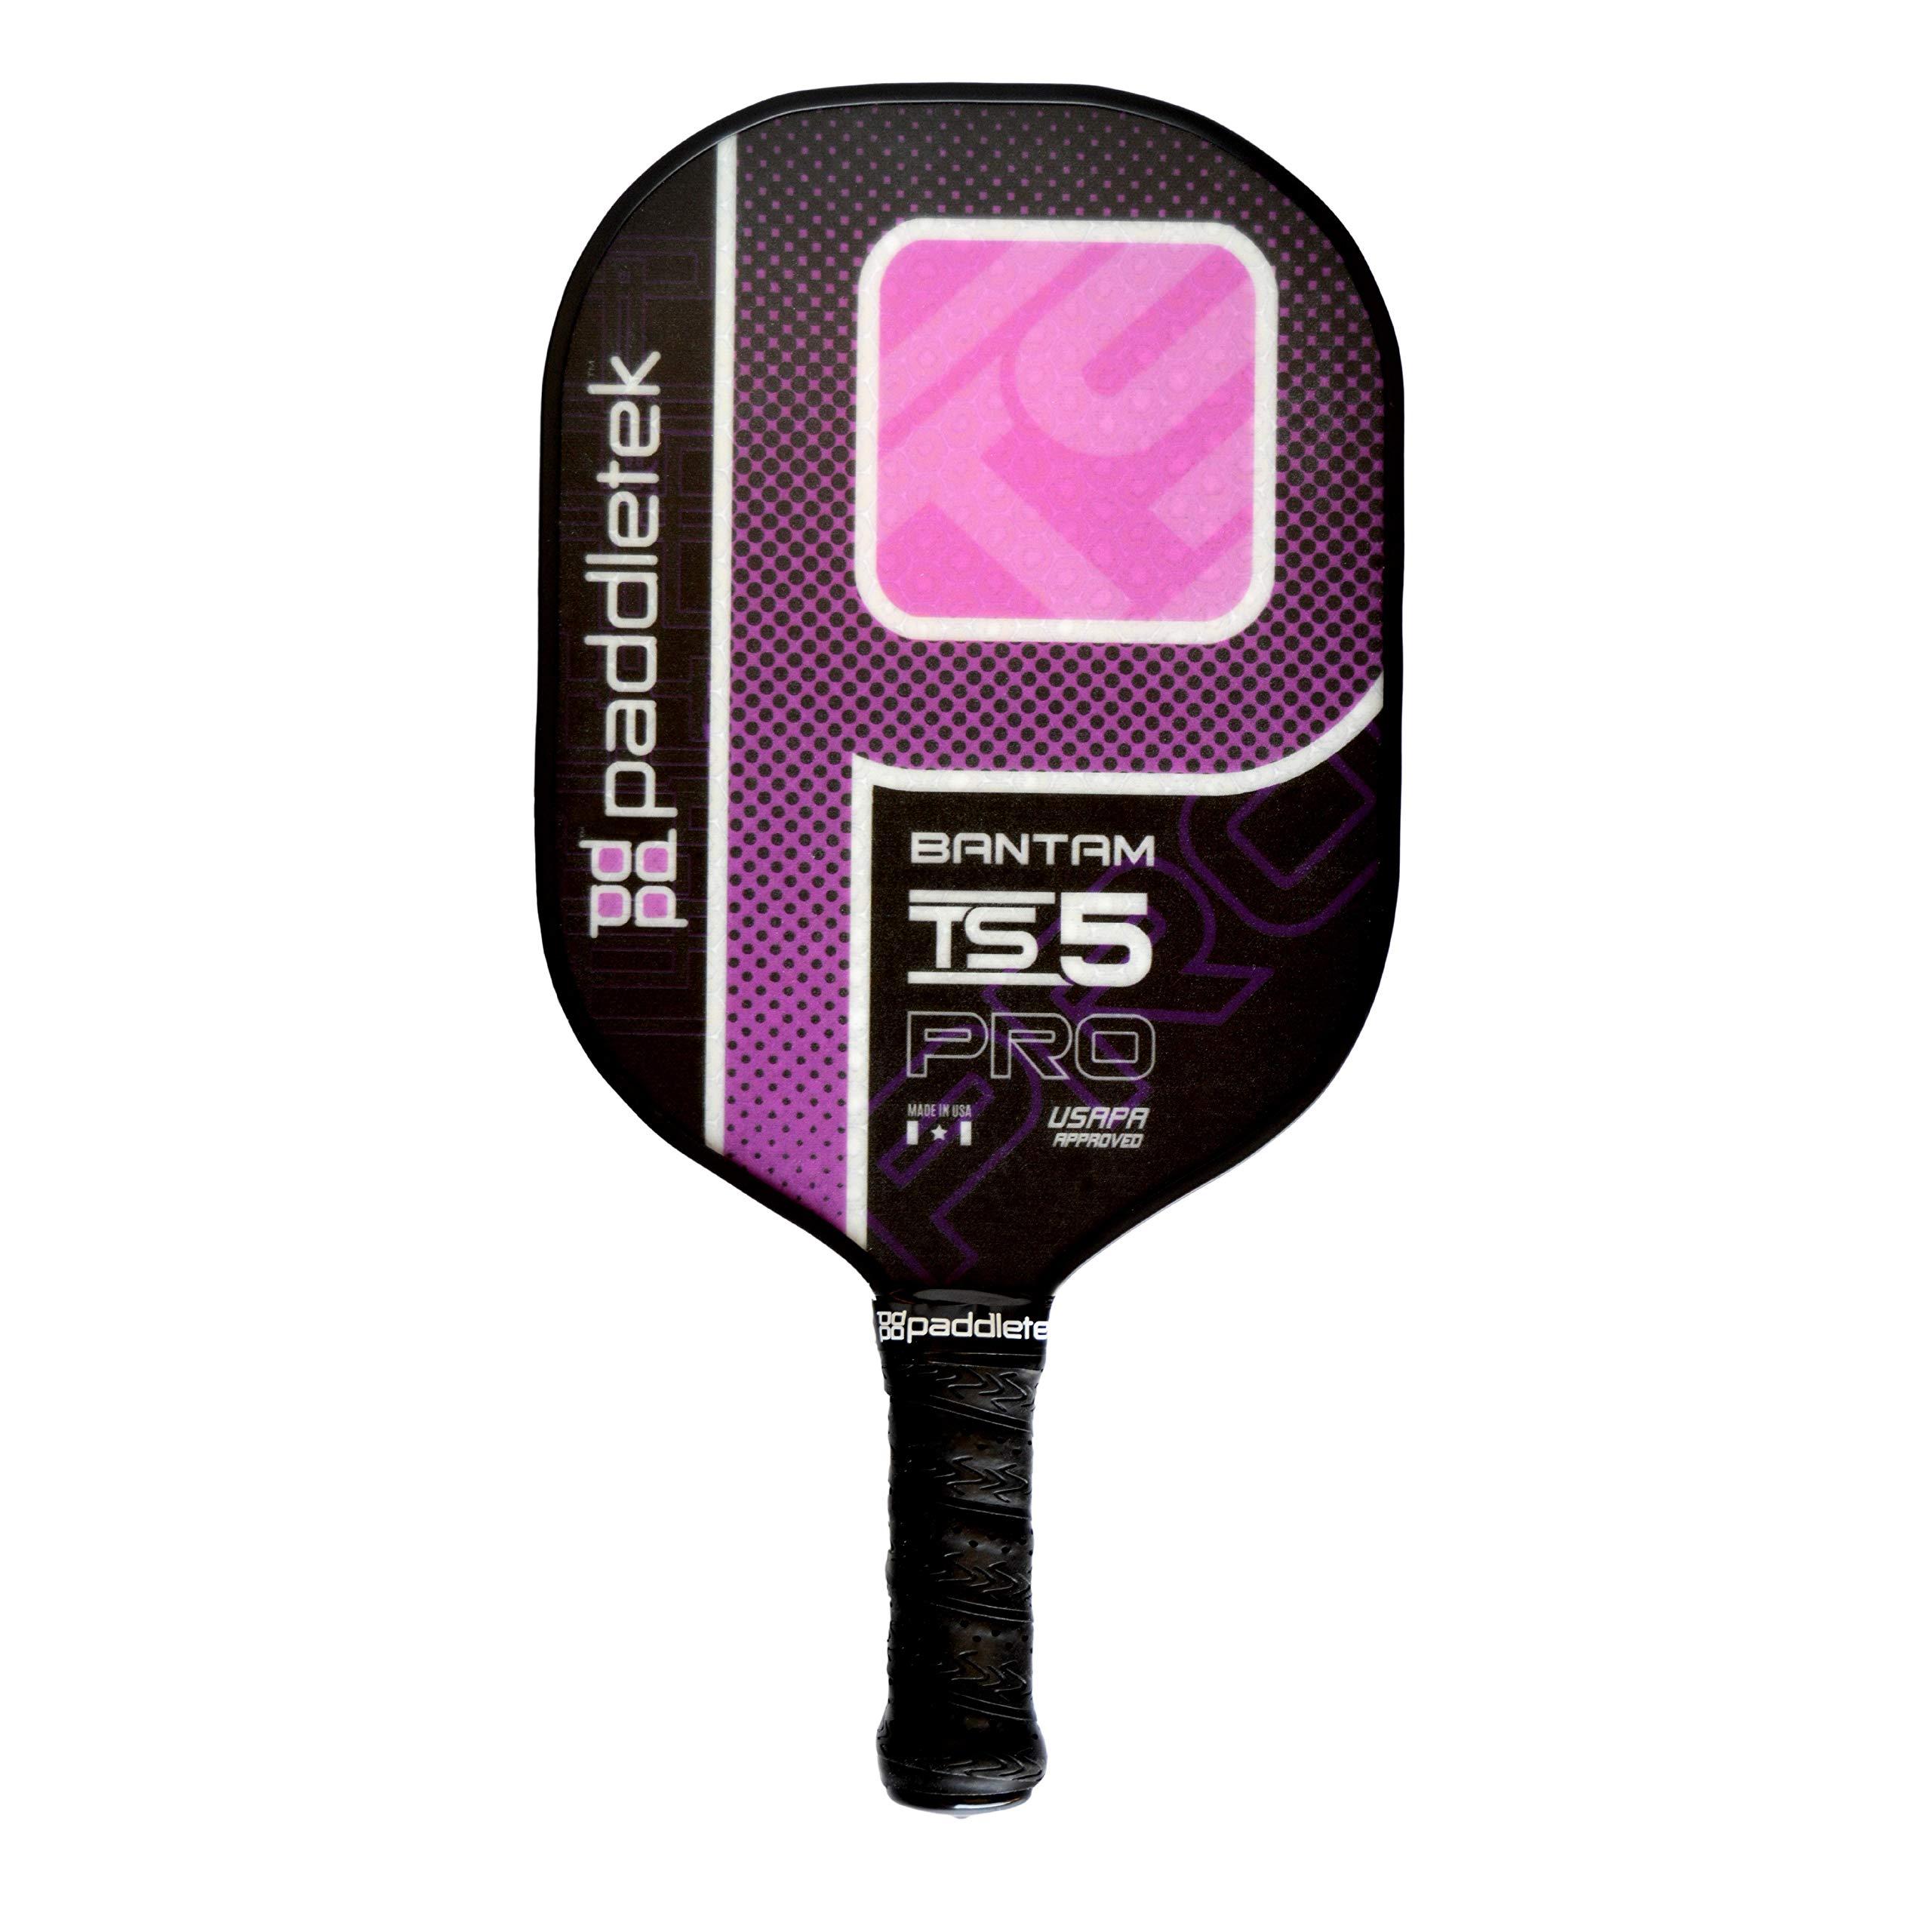 Paddletek Bantam TS-5 Pro Composite - Pink - Large (4 3/8'') - Standard Weight